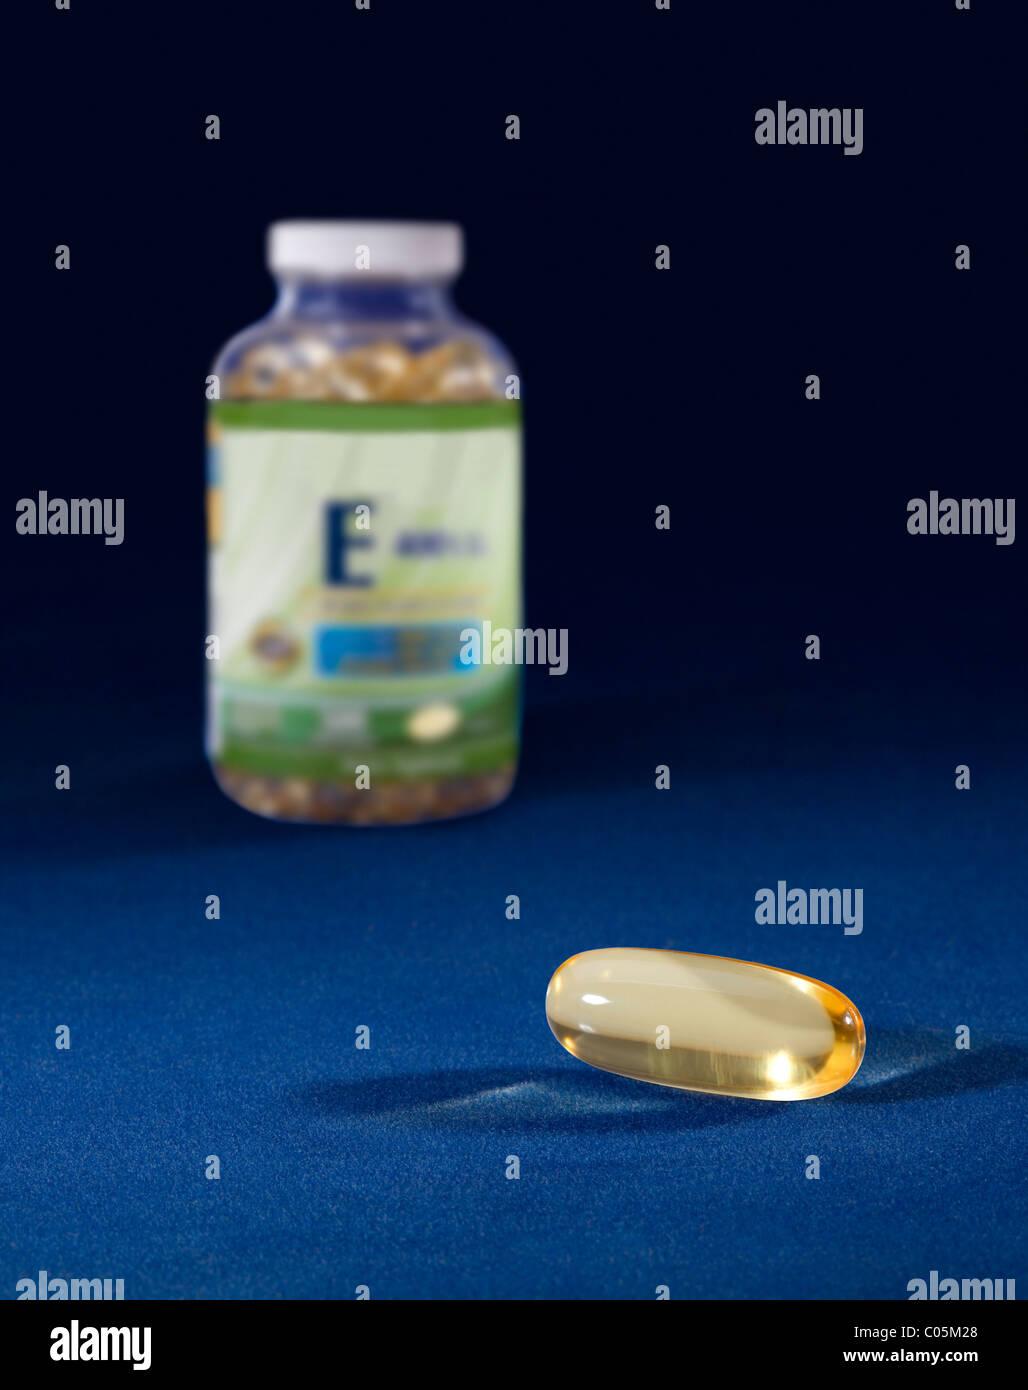 Una cápsula de vitamina E de suplemento nutricional. Imagen De Stock